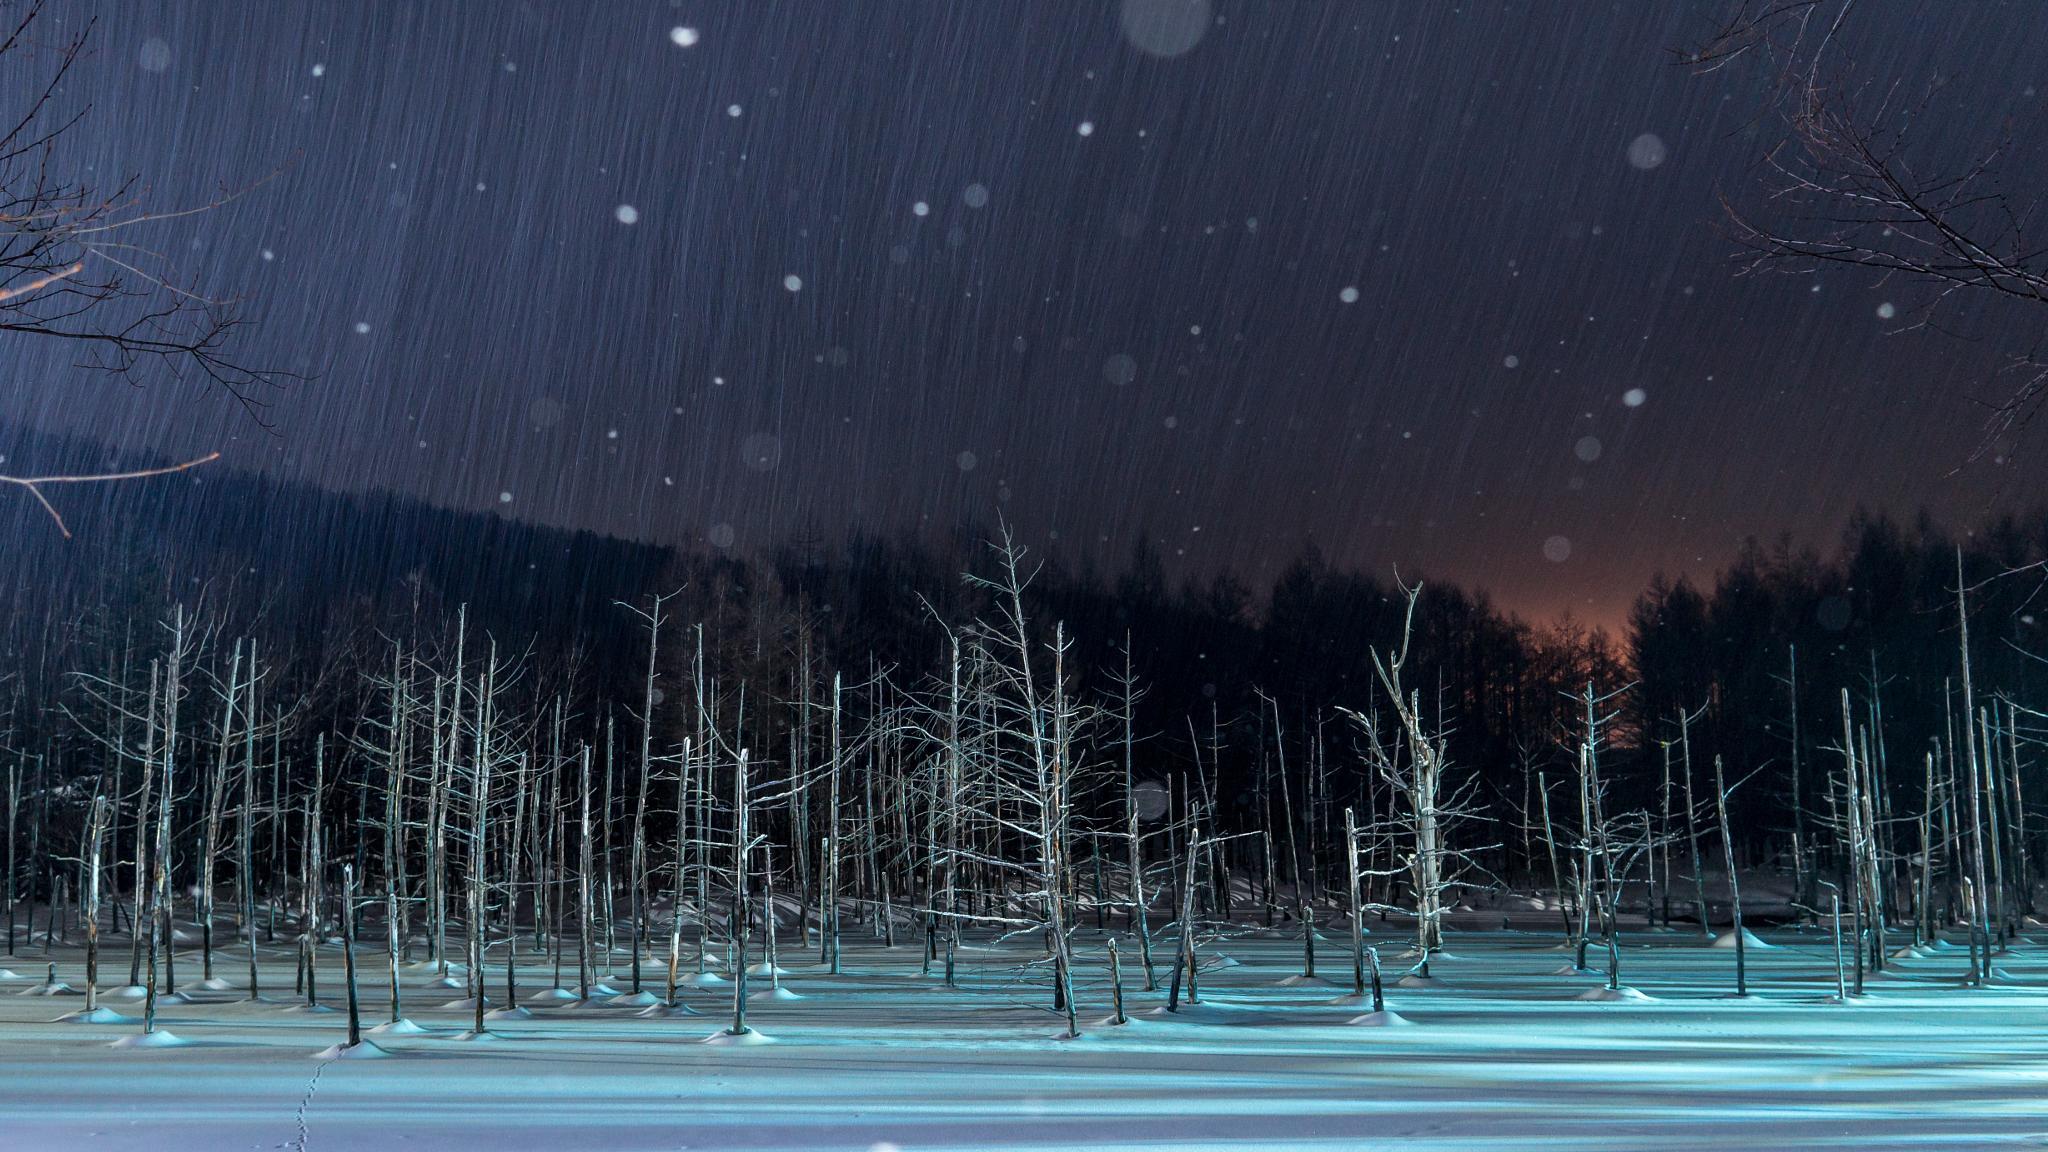 Blue pond of snowfall by Ryo Iwasaki